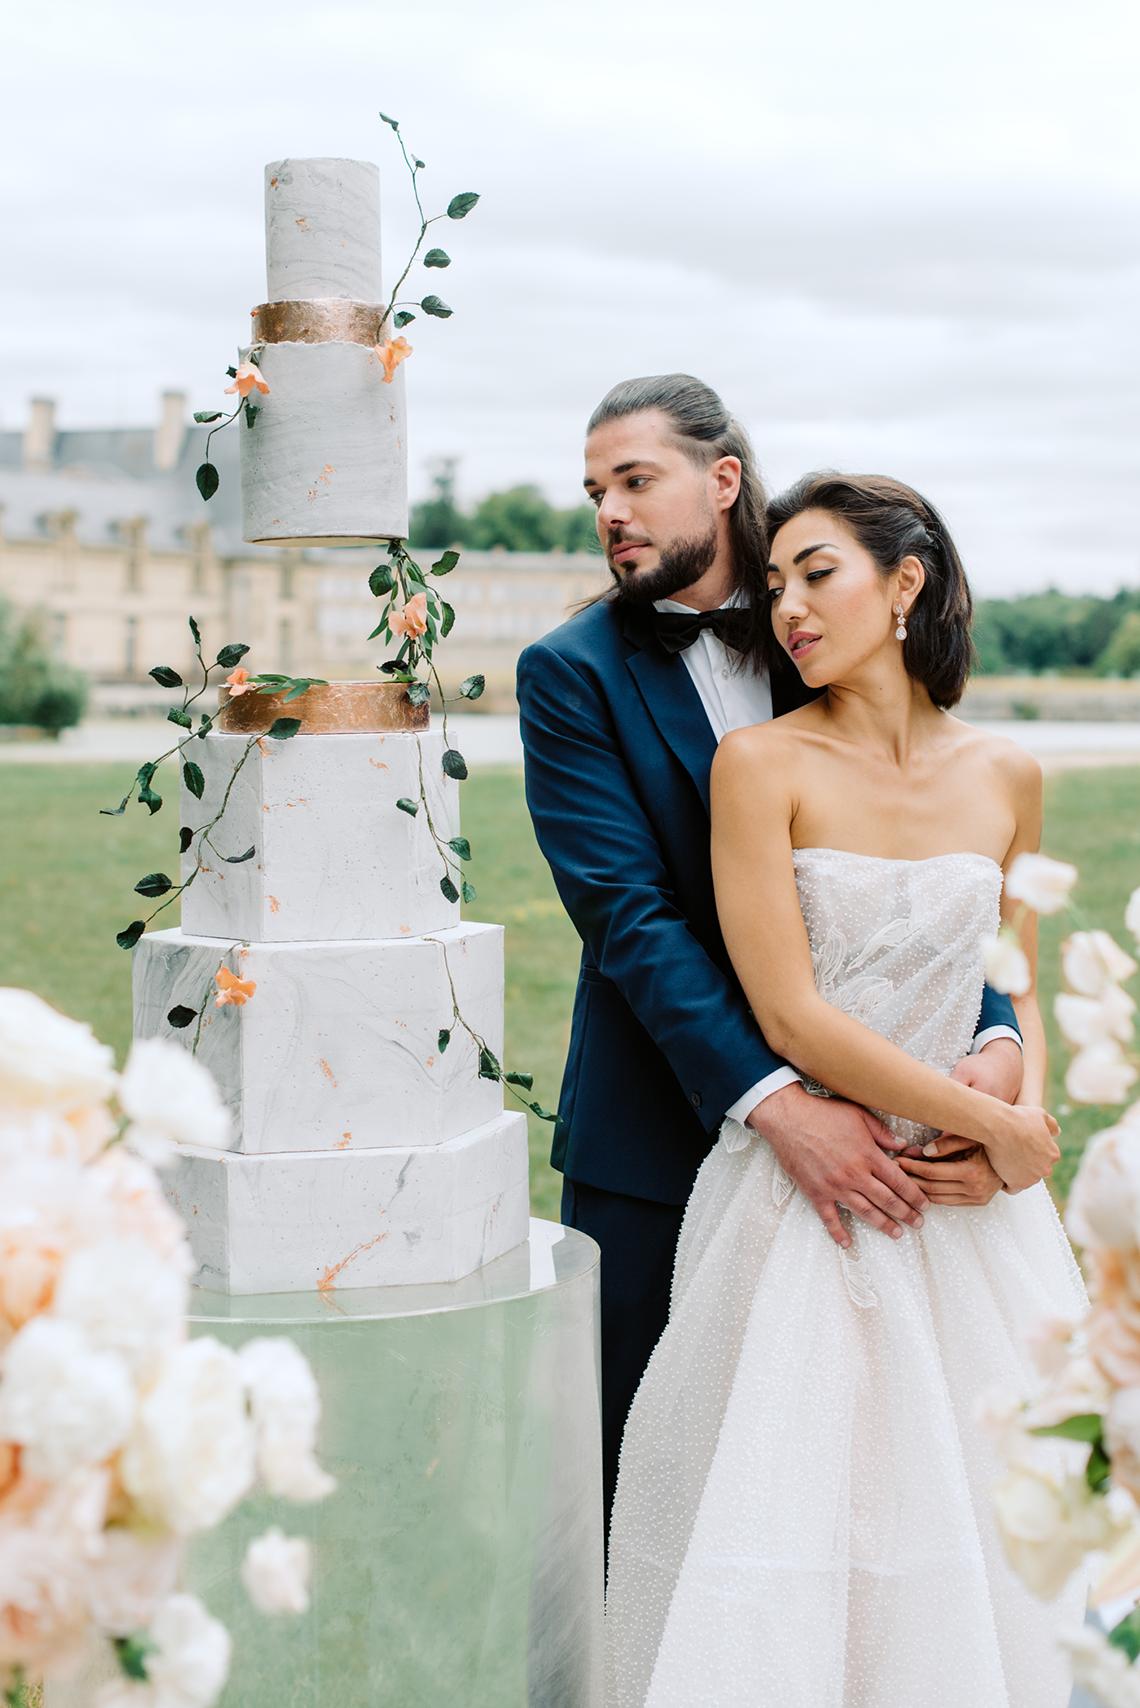 Princess Wedding Inspiration from France – Chateau Chantilly – Elizaveta Photography 41